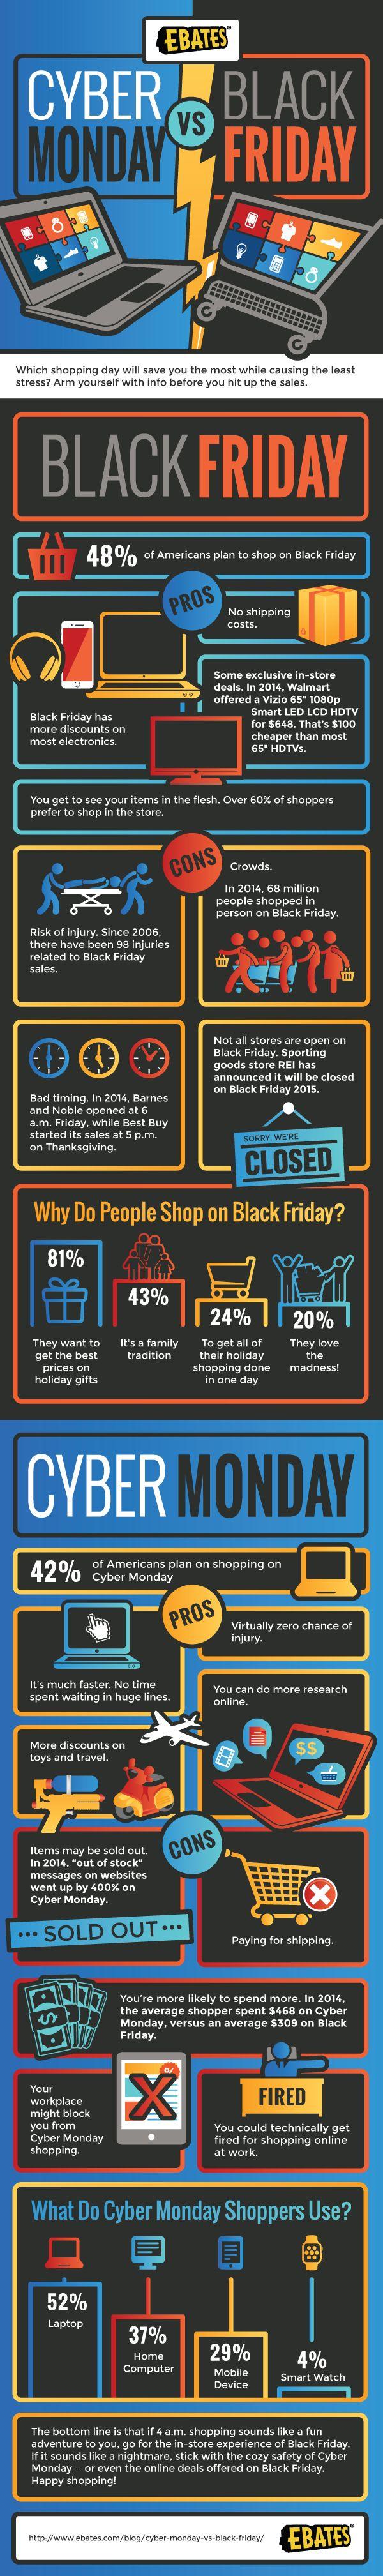 Cyber Monday vs. Black Friday #infographic